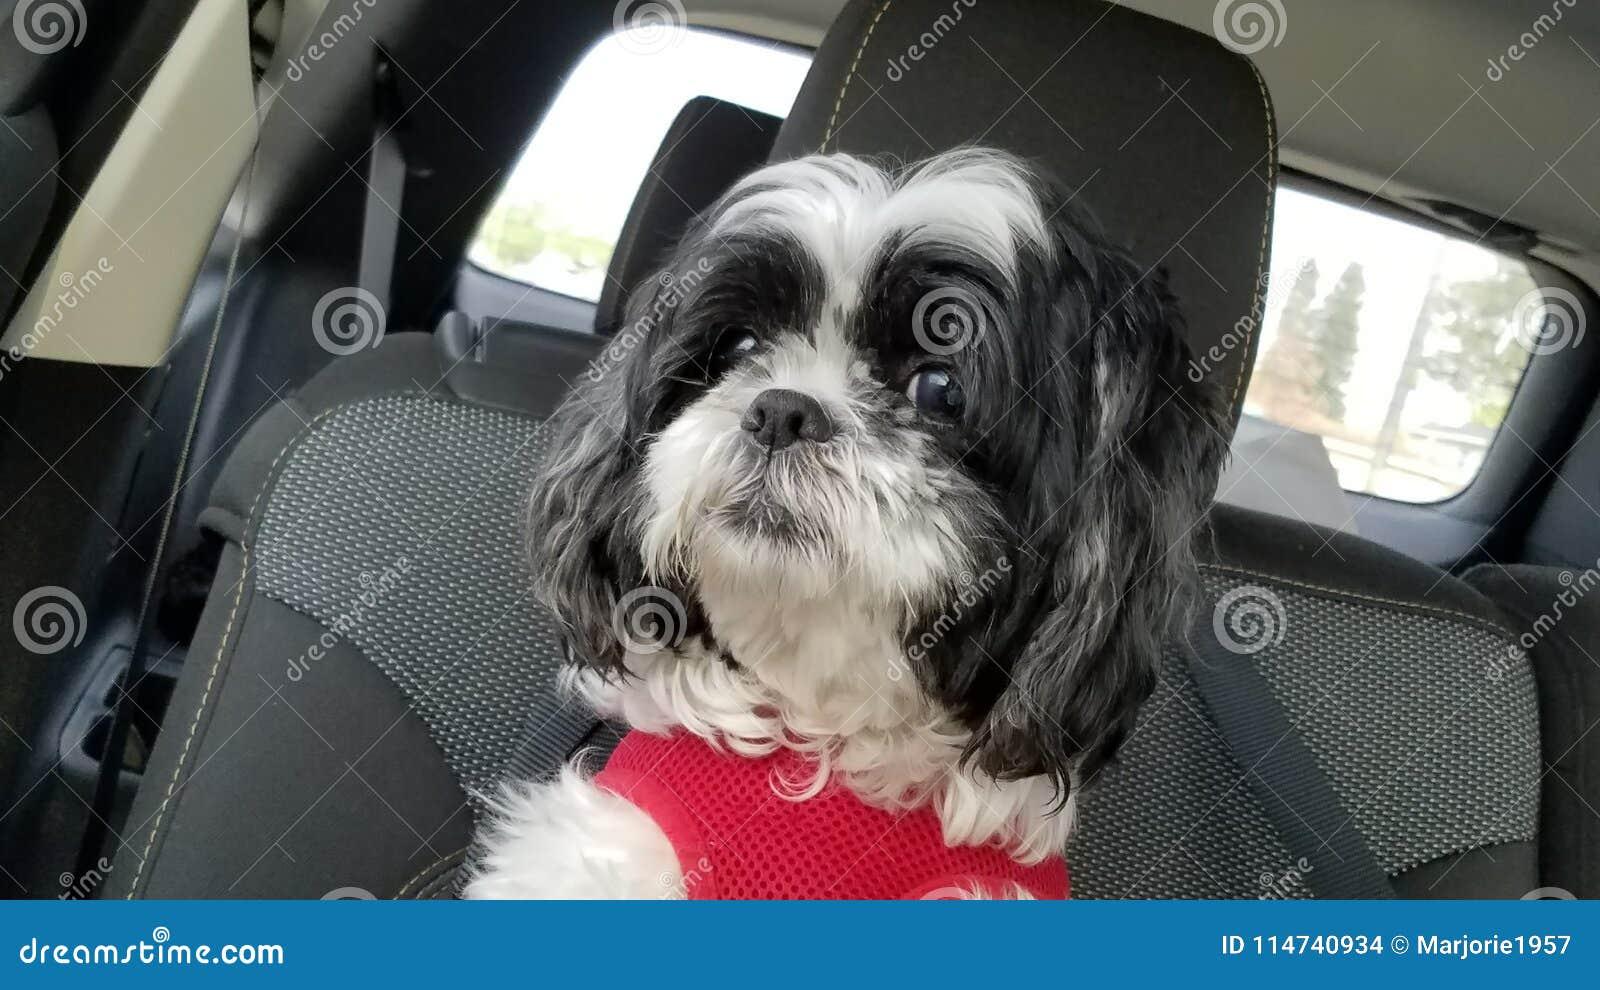 Shih tzu dog inside car